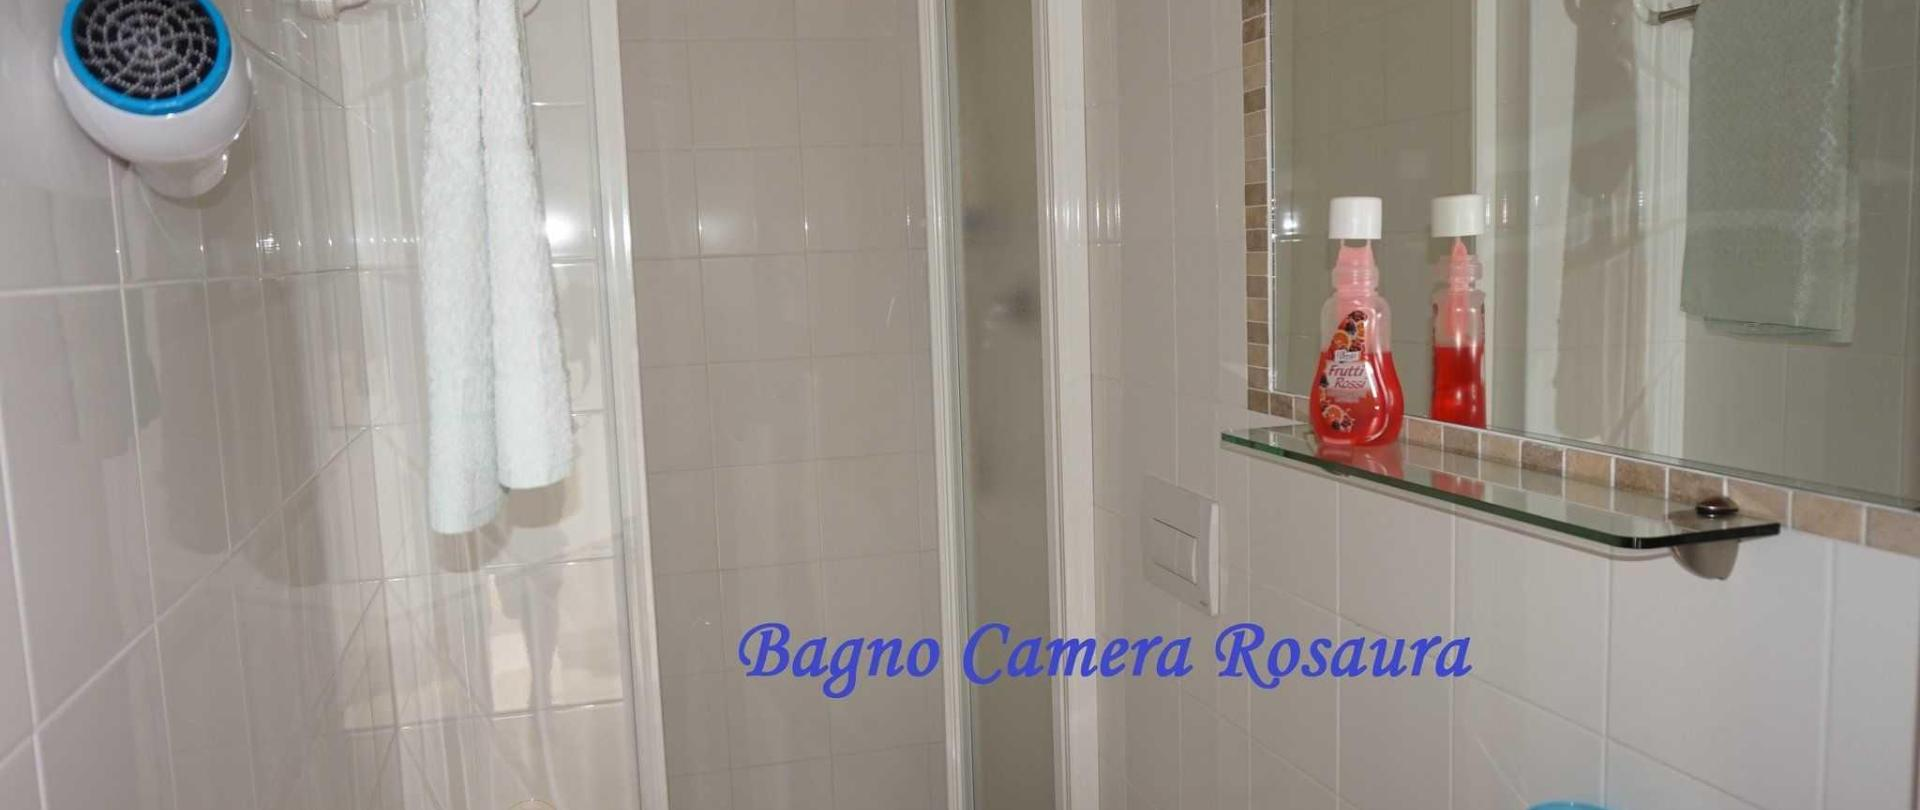 bagno-rosaura-2.JPG